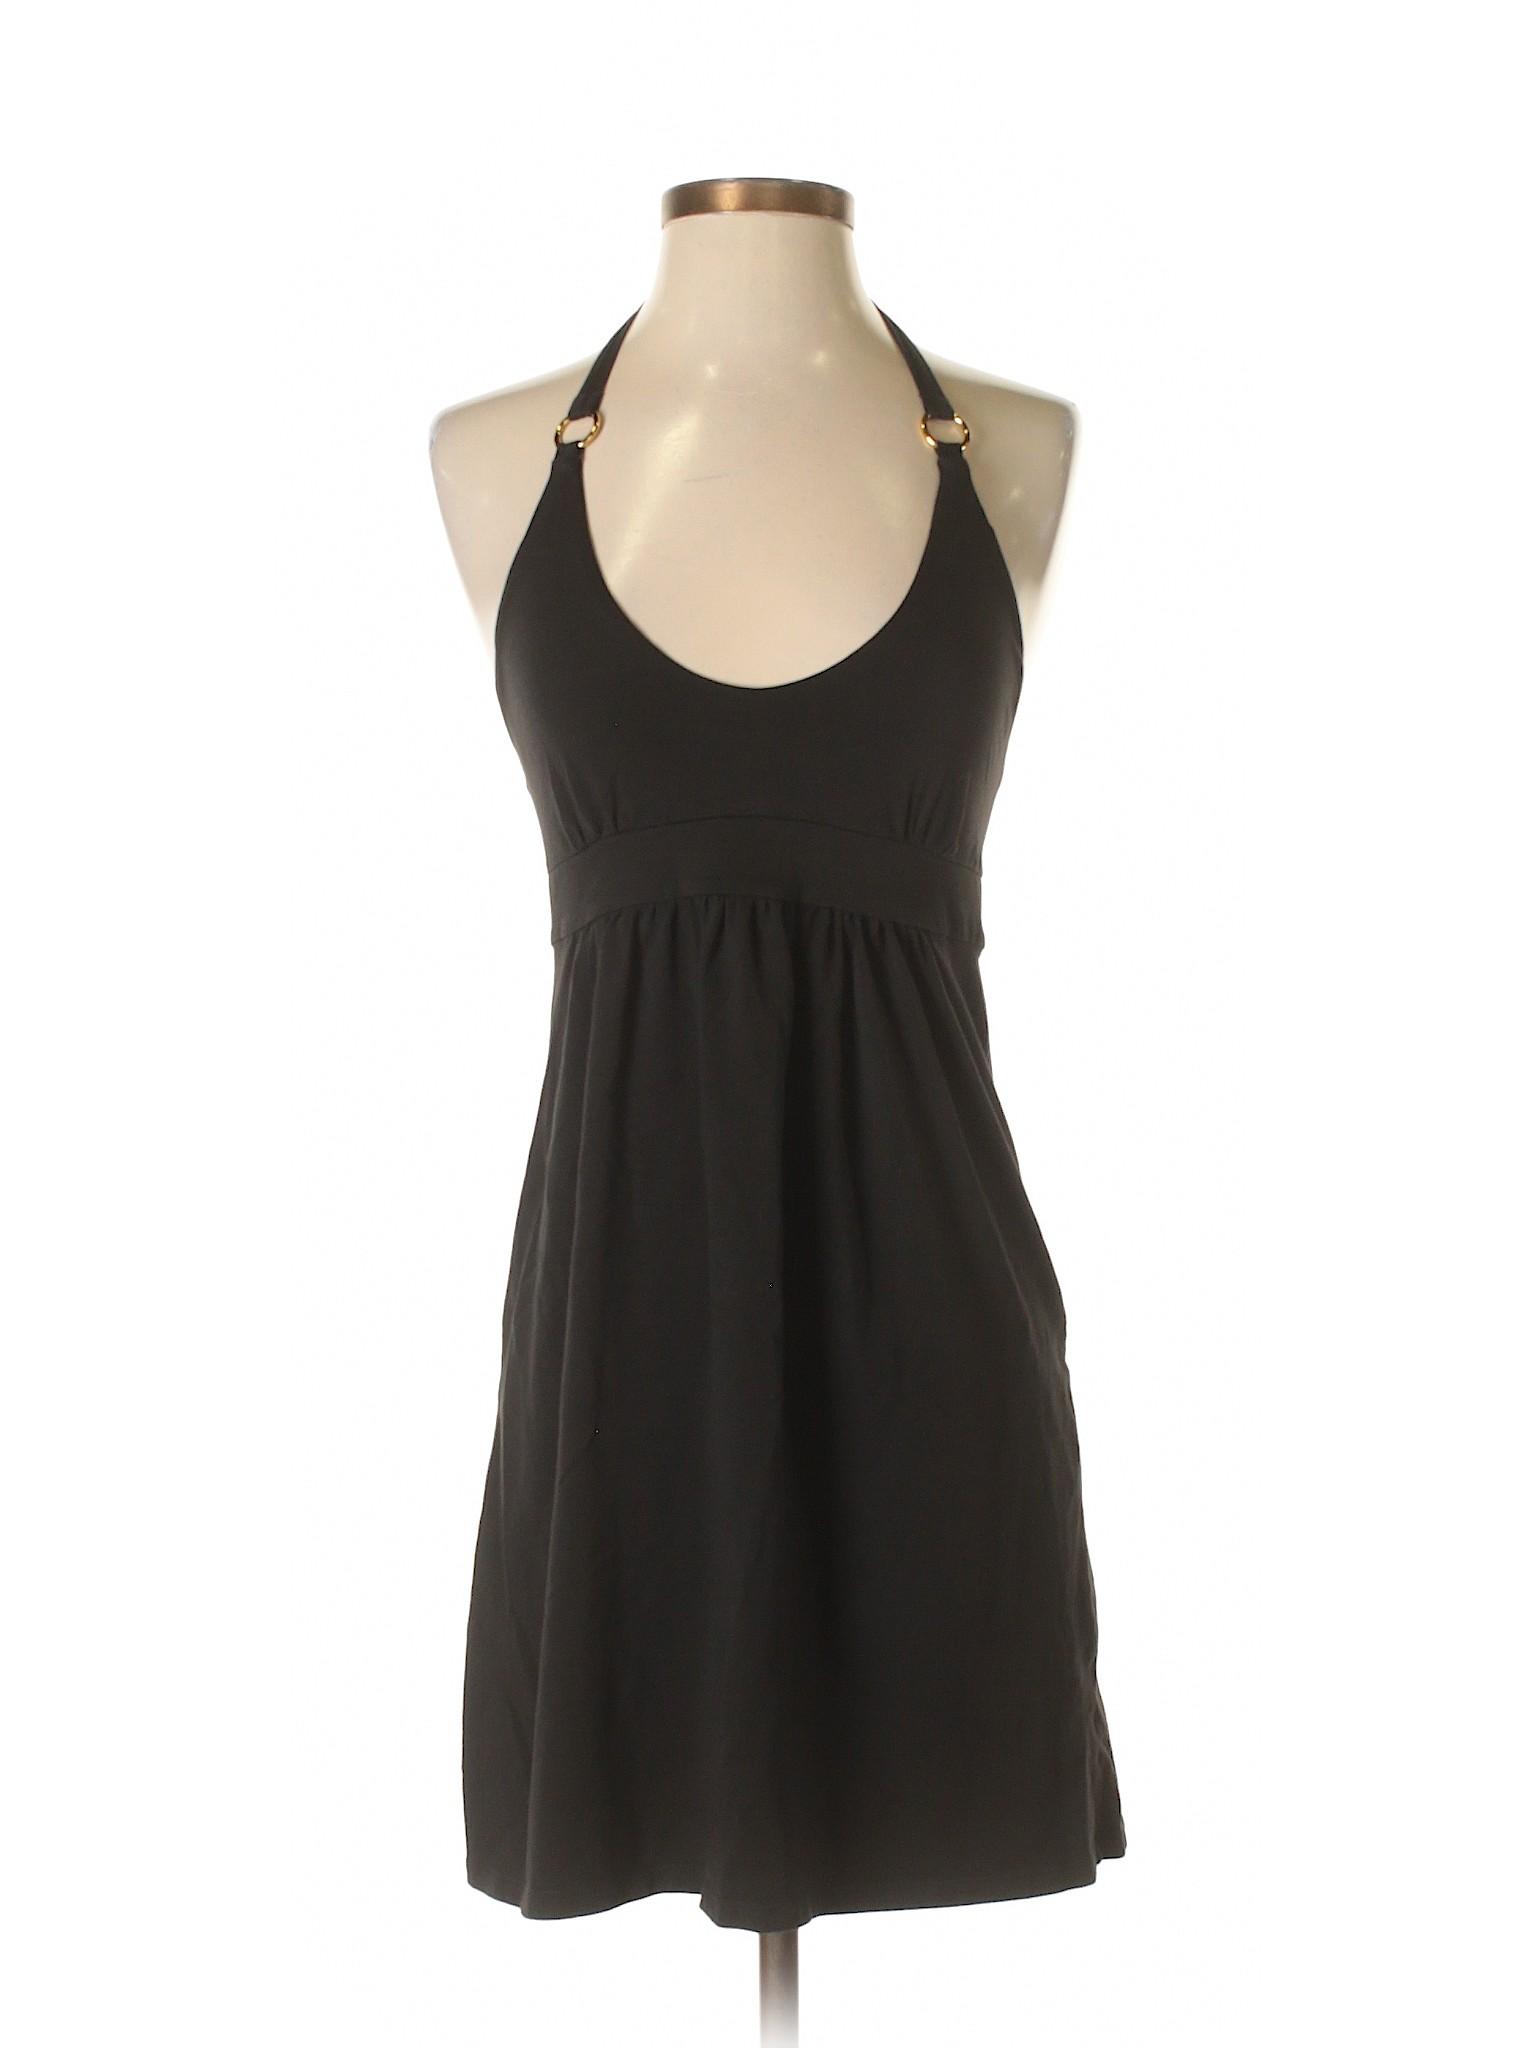 Casual Victoria's Secret Dress Selling Victoria's Selling wTOPF